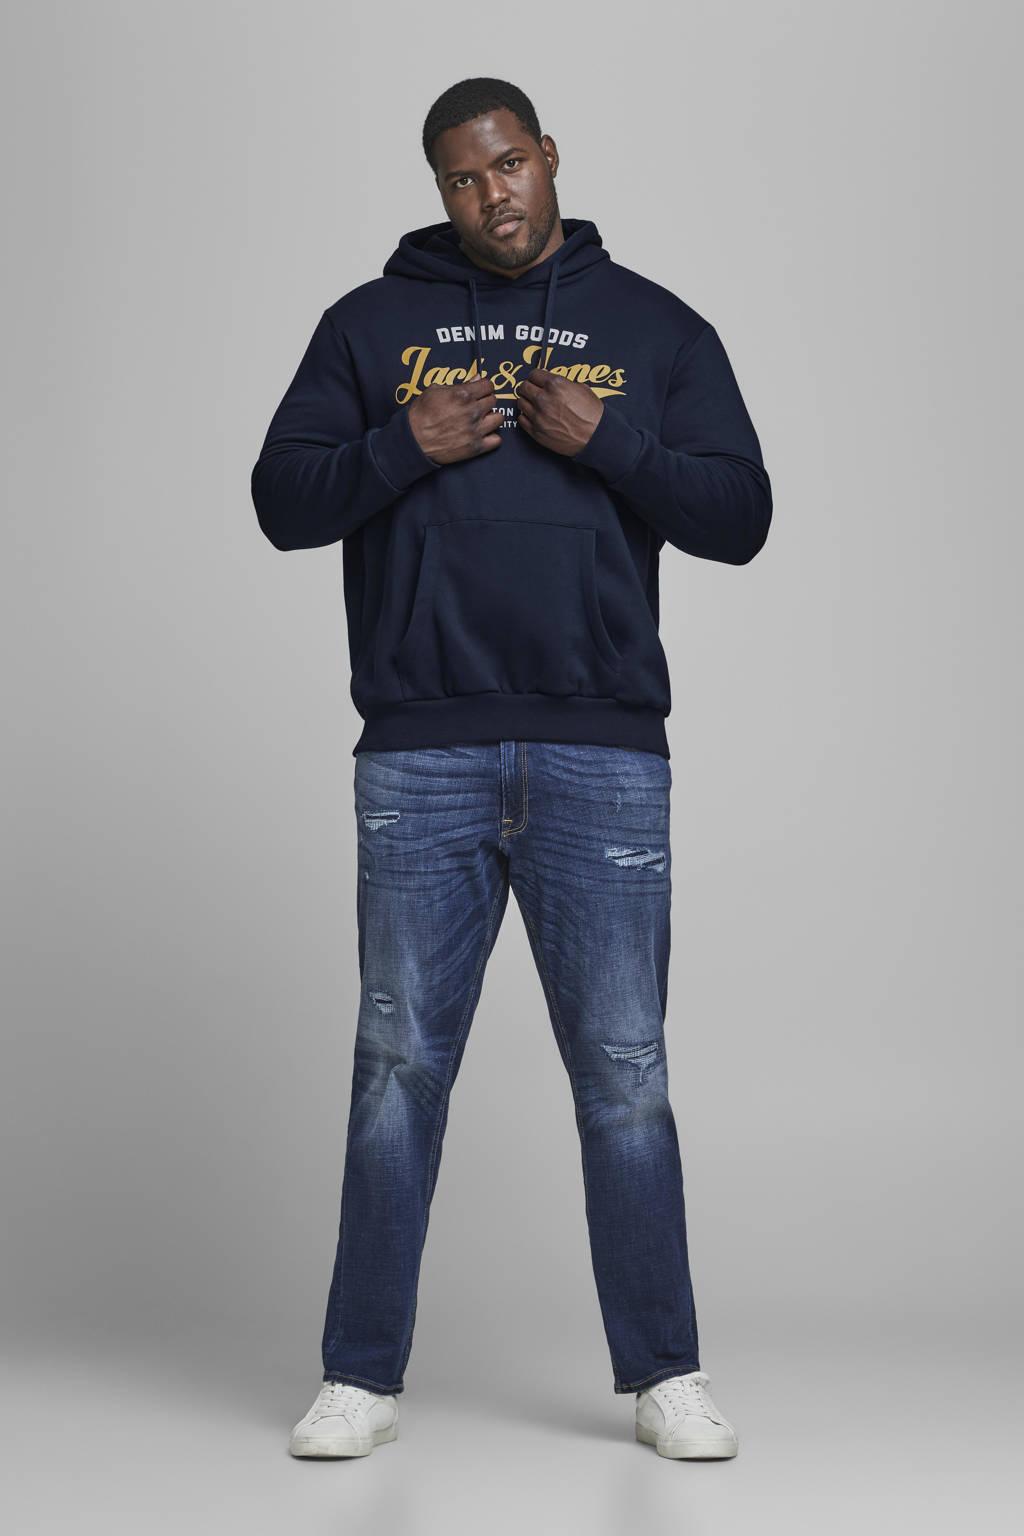 JACK & JONES PLUS SIZE hoodie met logo donkerblauw, Donkerblauw